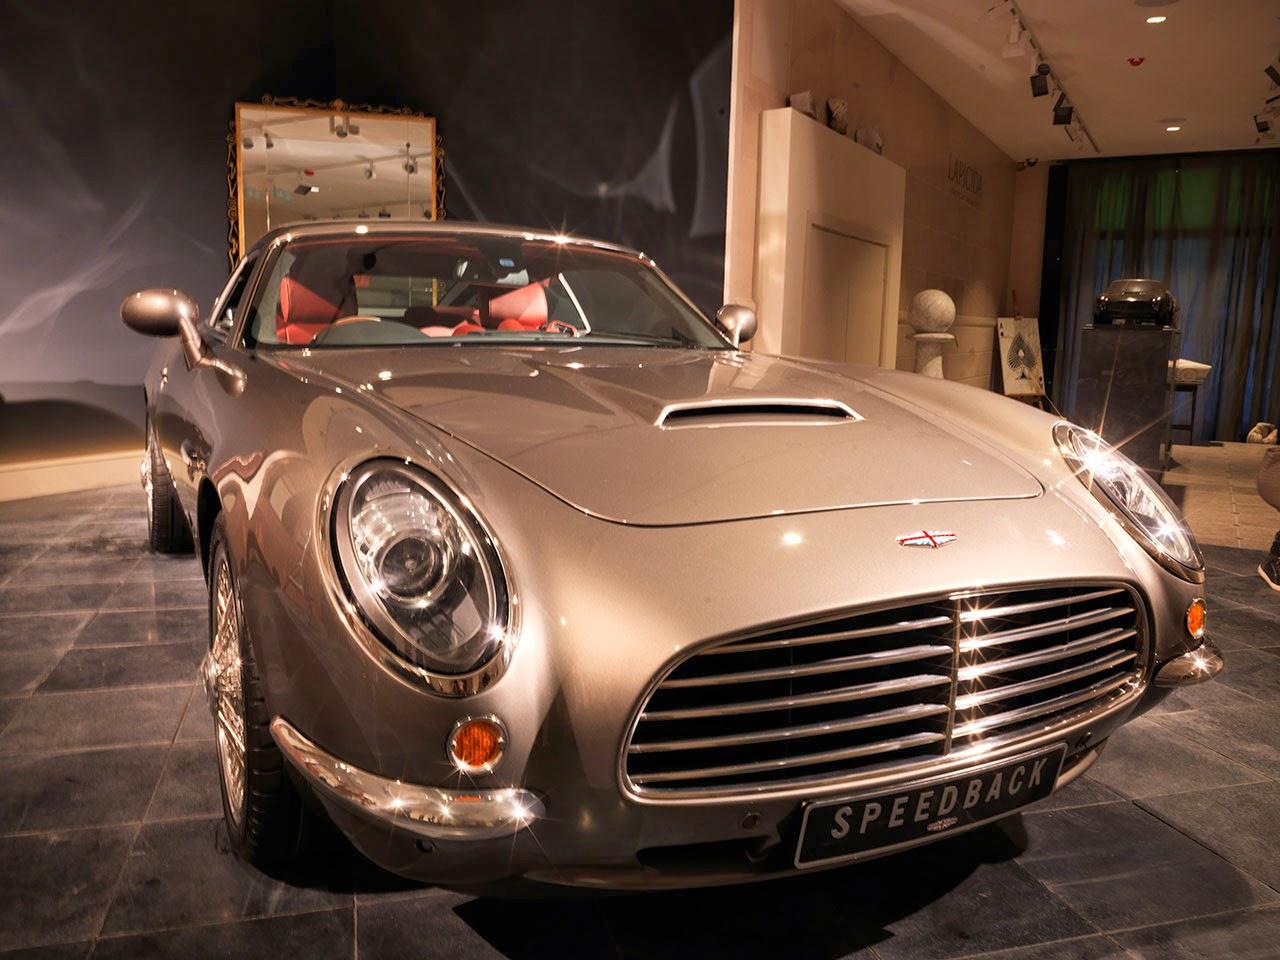 David Brown Automotive Speedback front